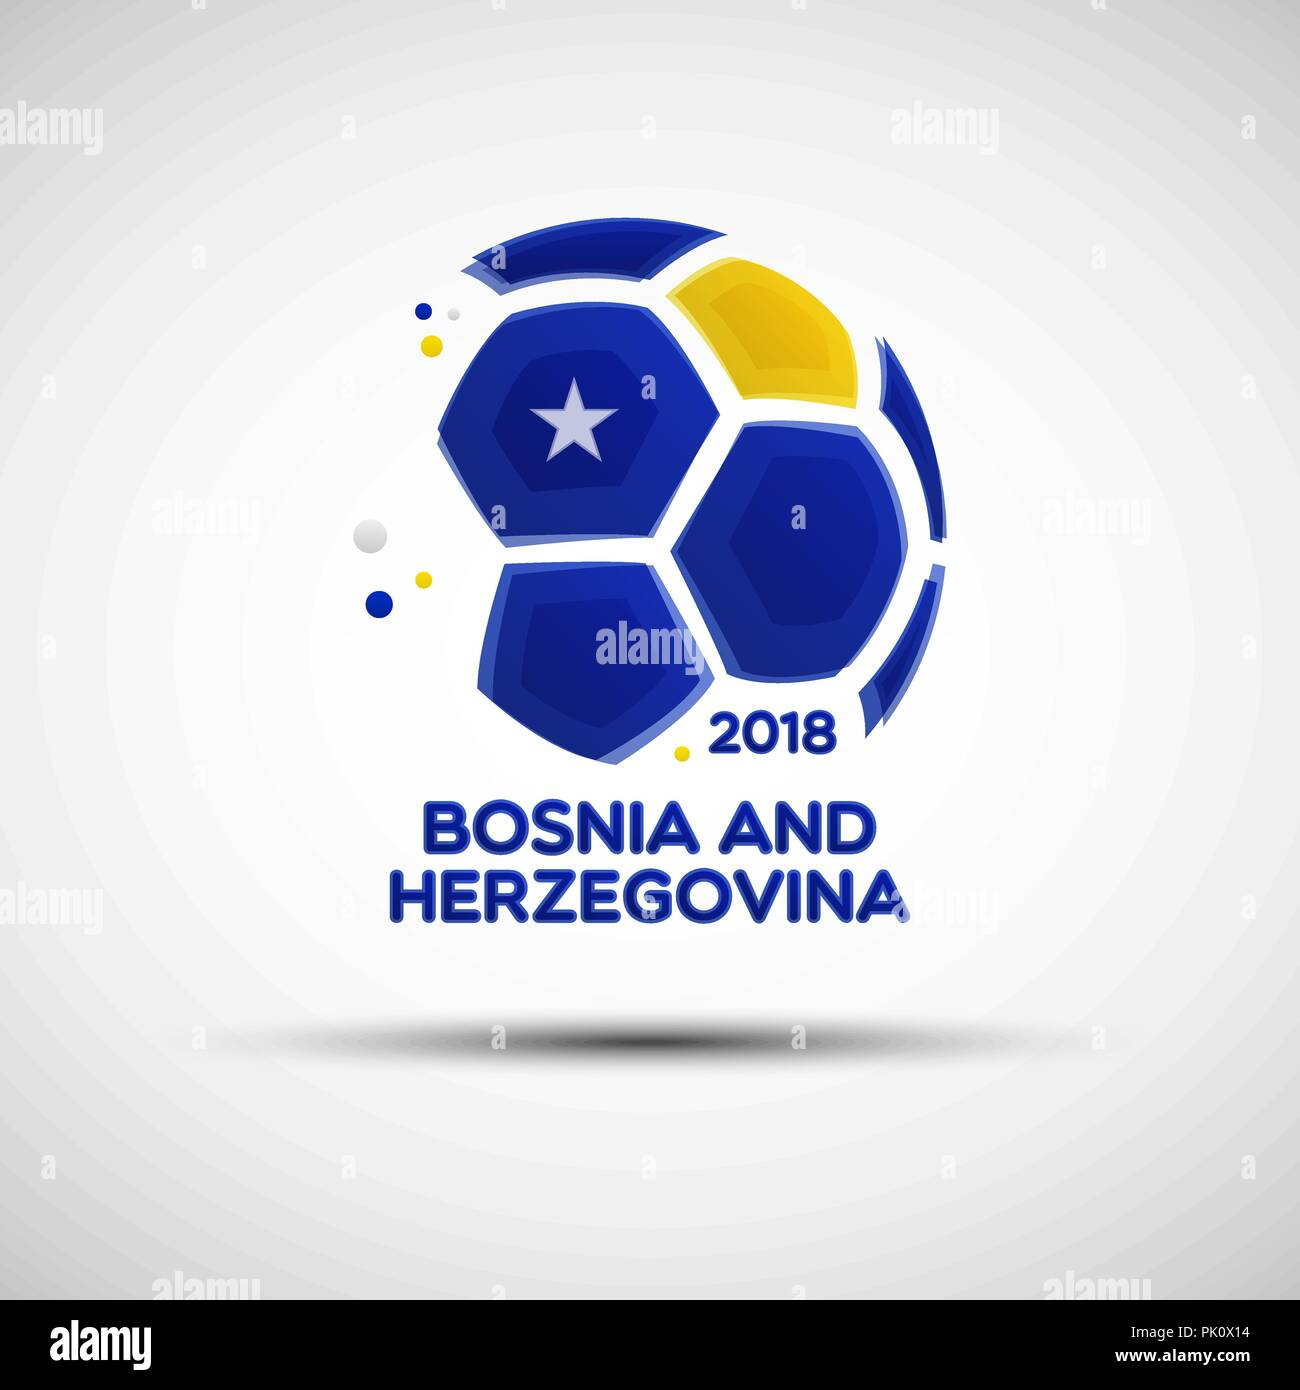 Football championship banner. Flag of Bosnia and Herzegovina. Vector illustration of soccer ball with Bosnian and Herzegovinian national flag colors - Stock Vector